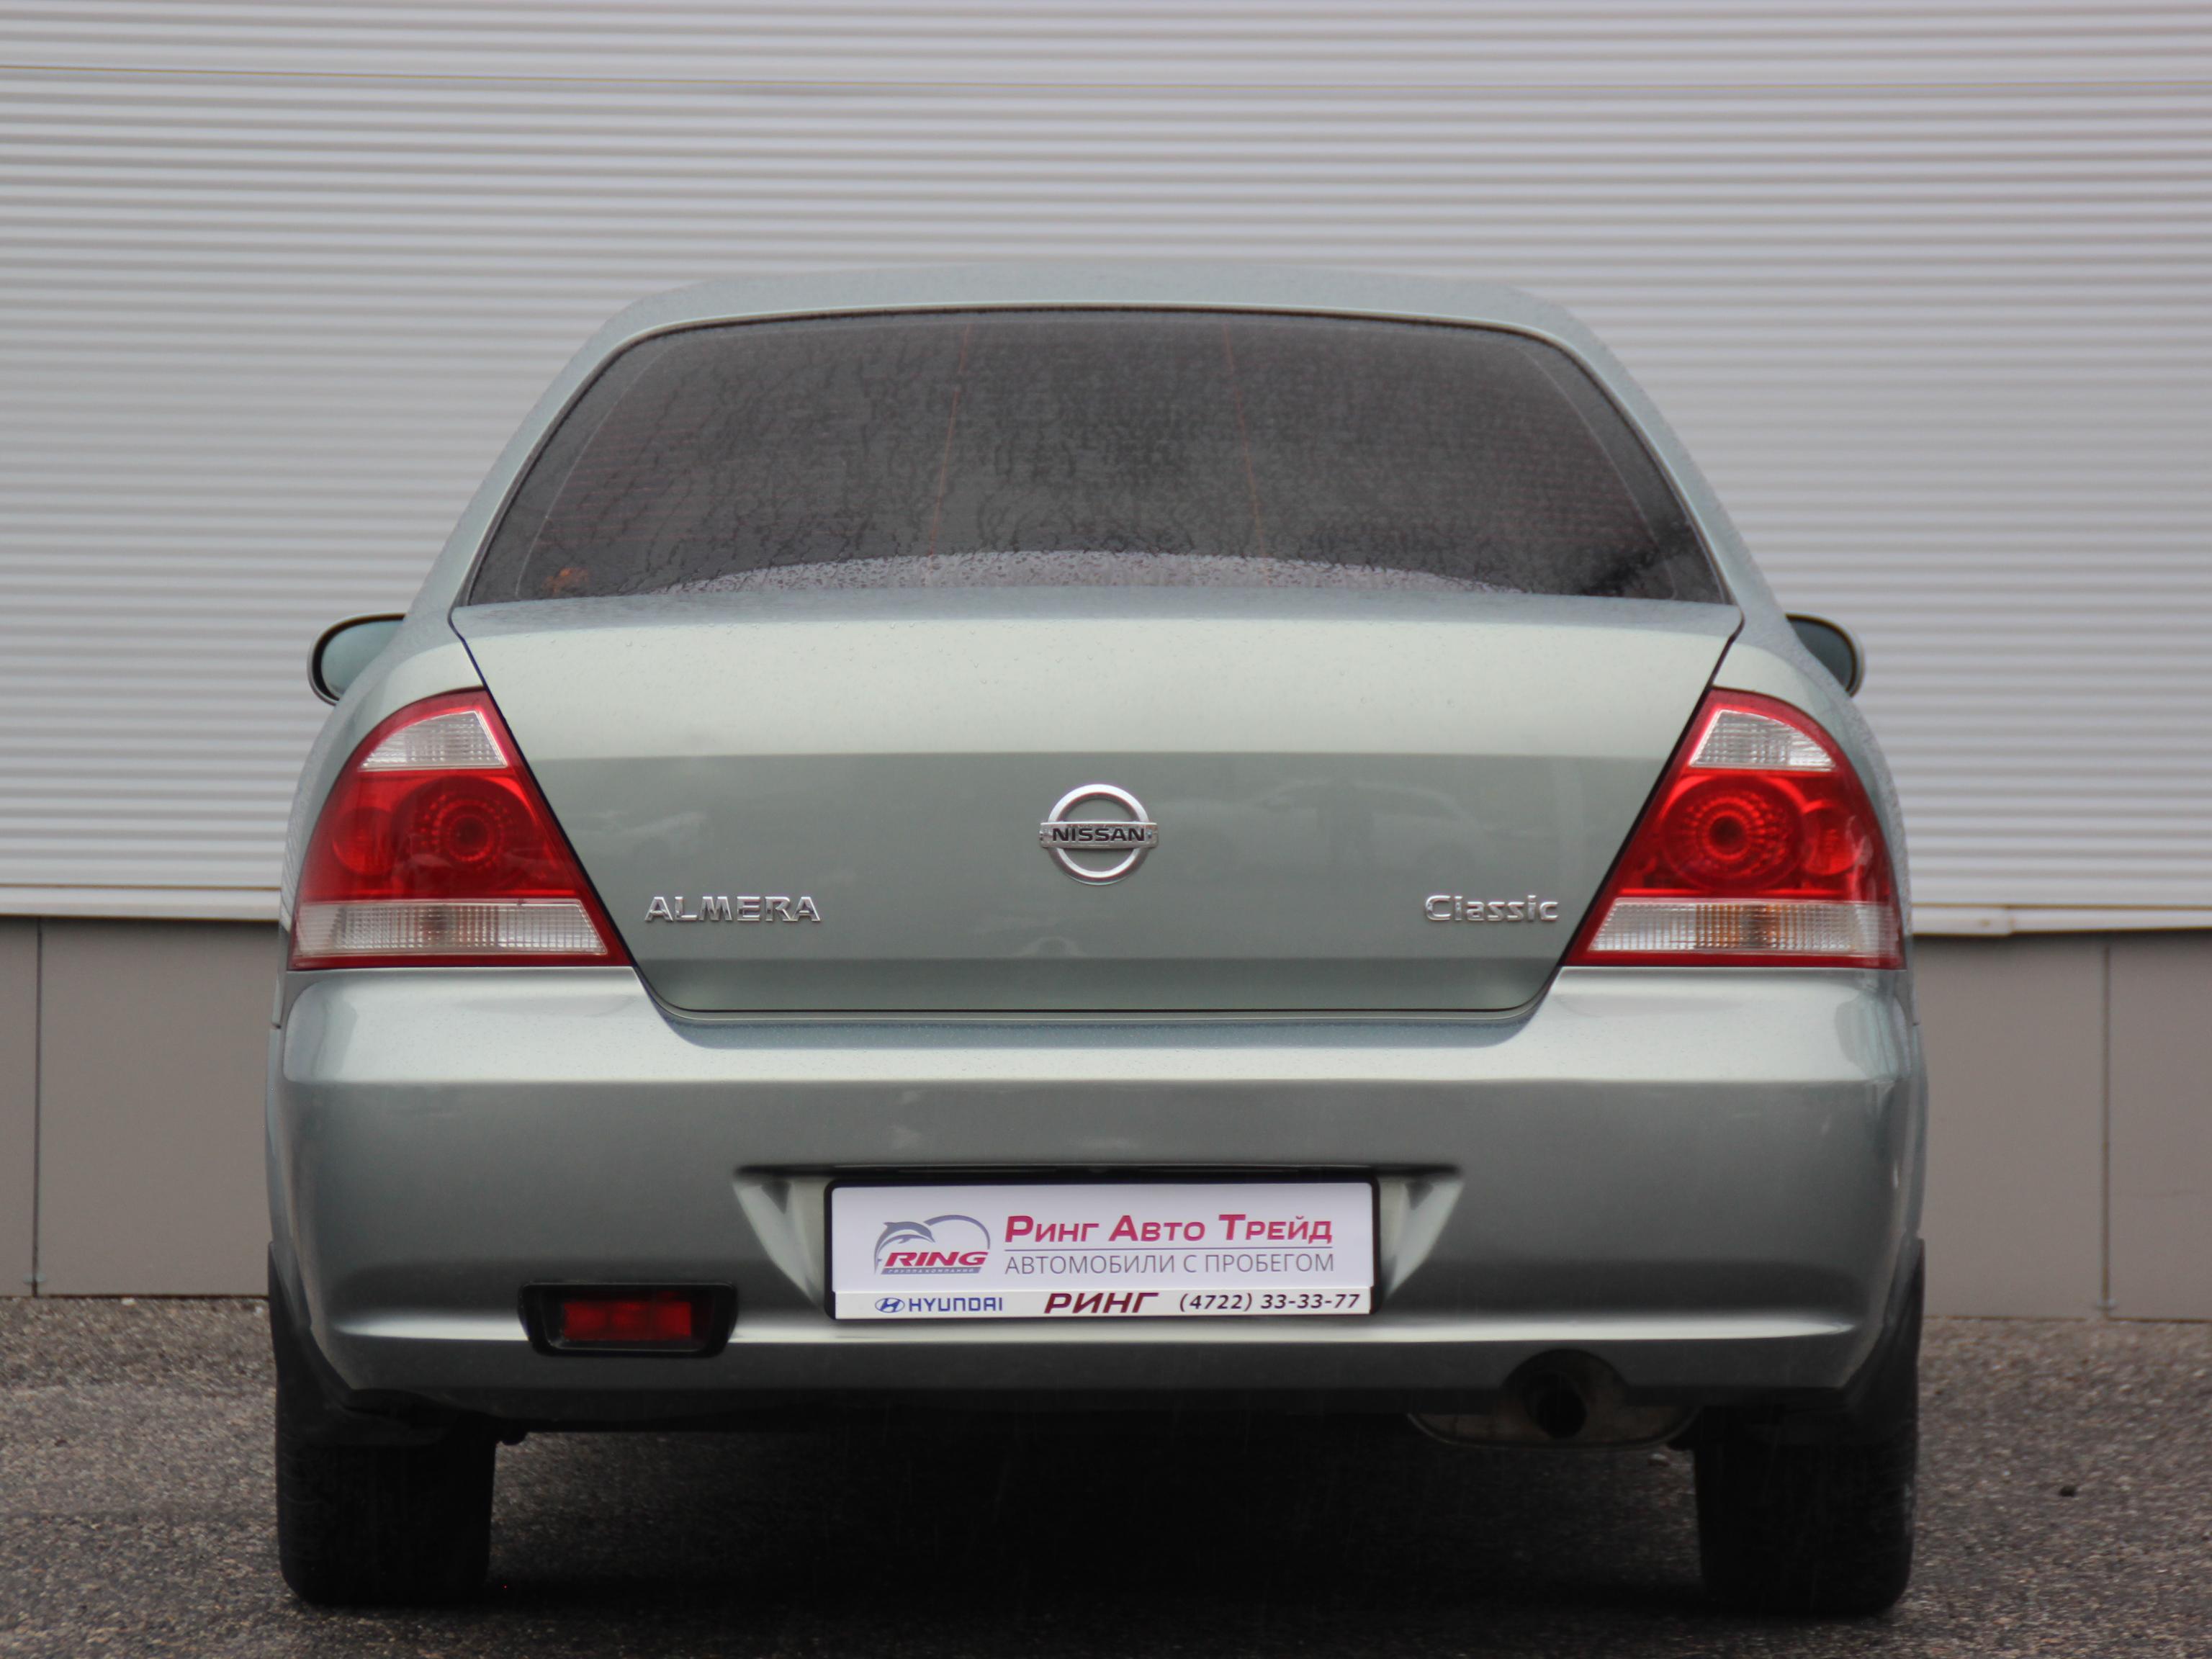 Nissan Almera Classic Седан (2006г.)